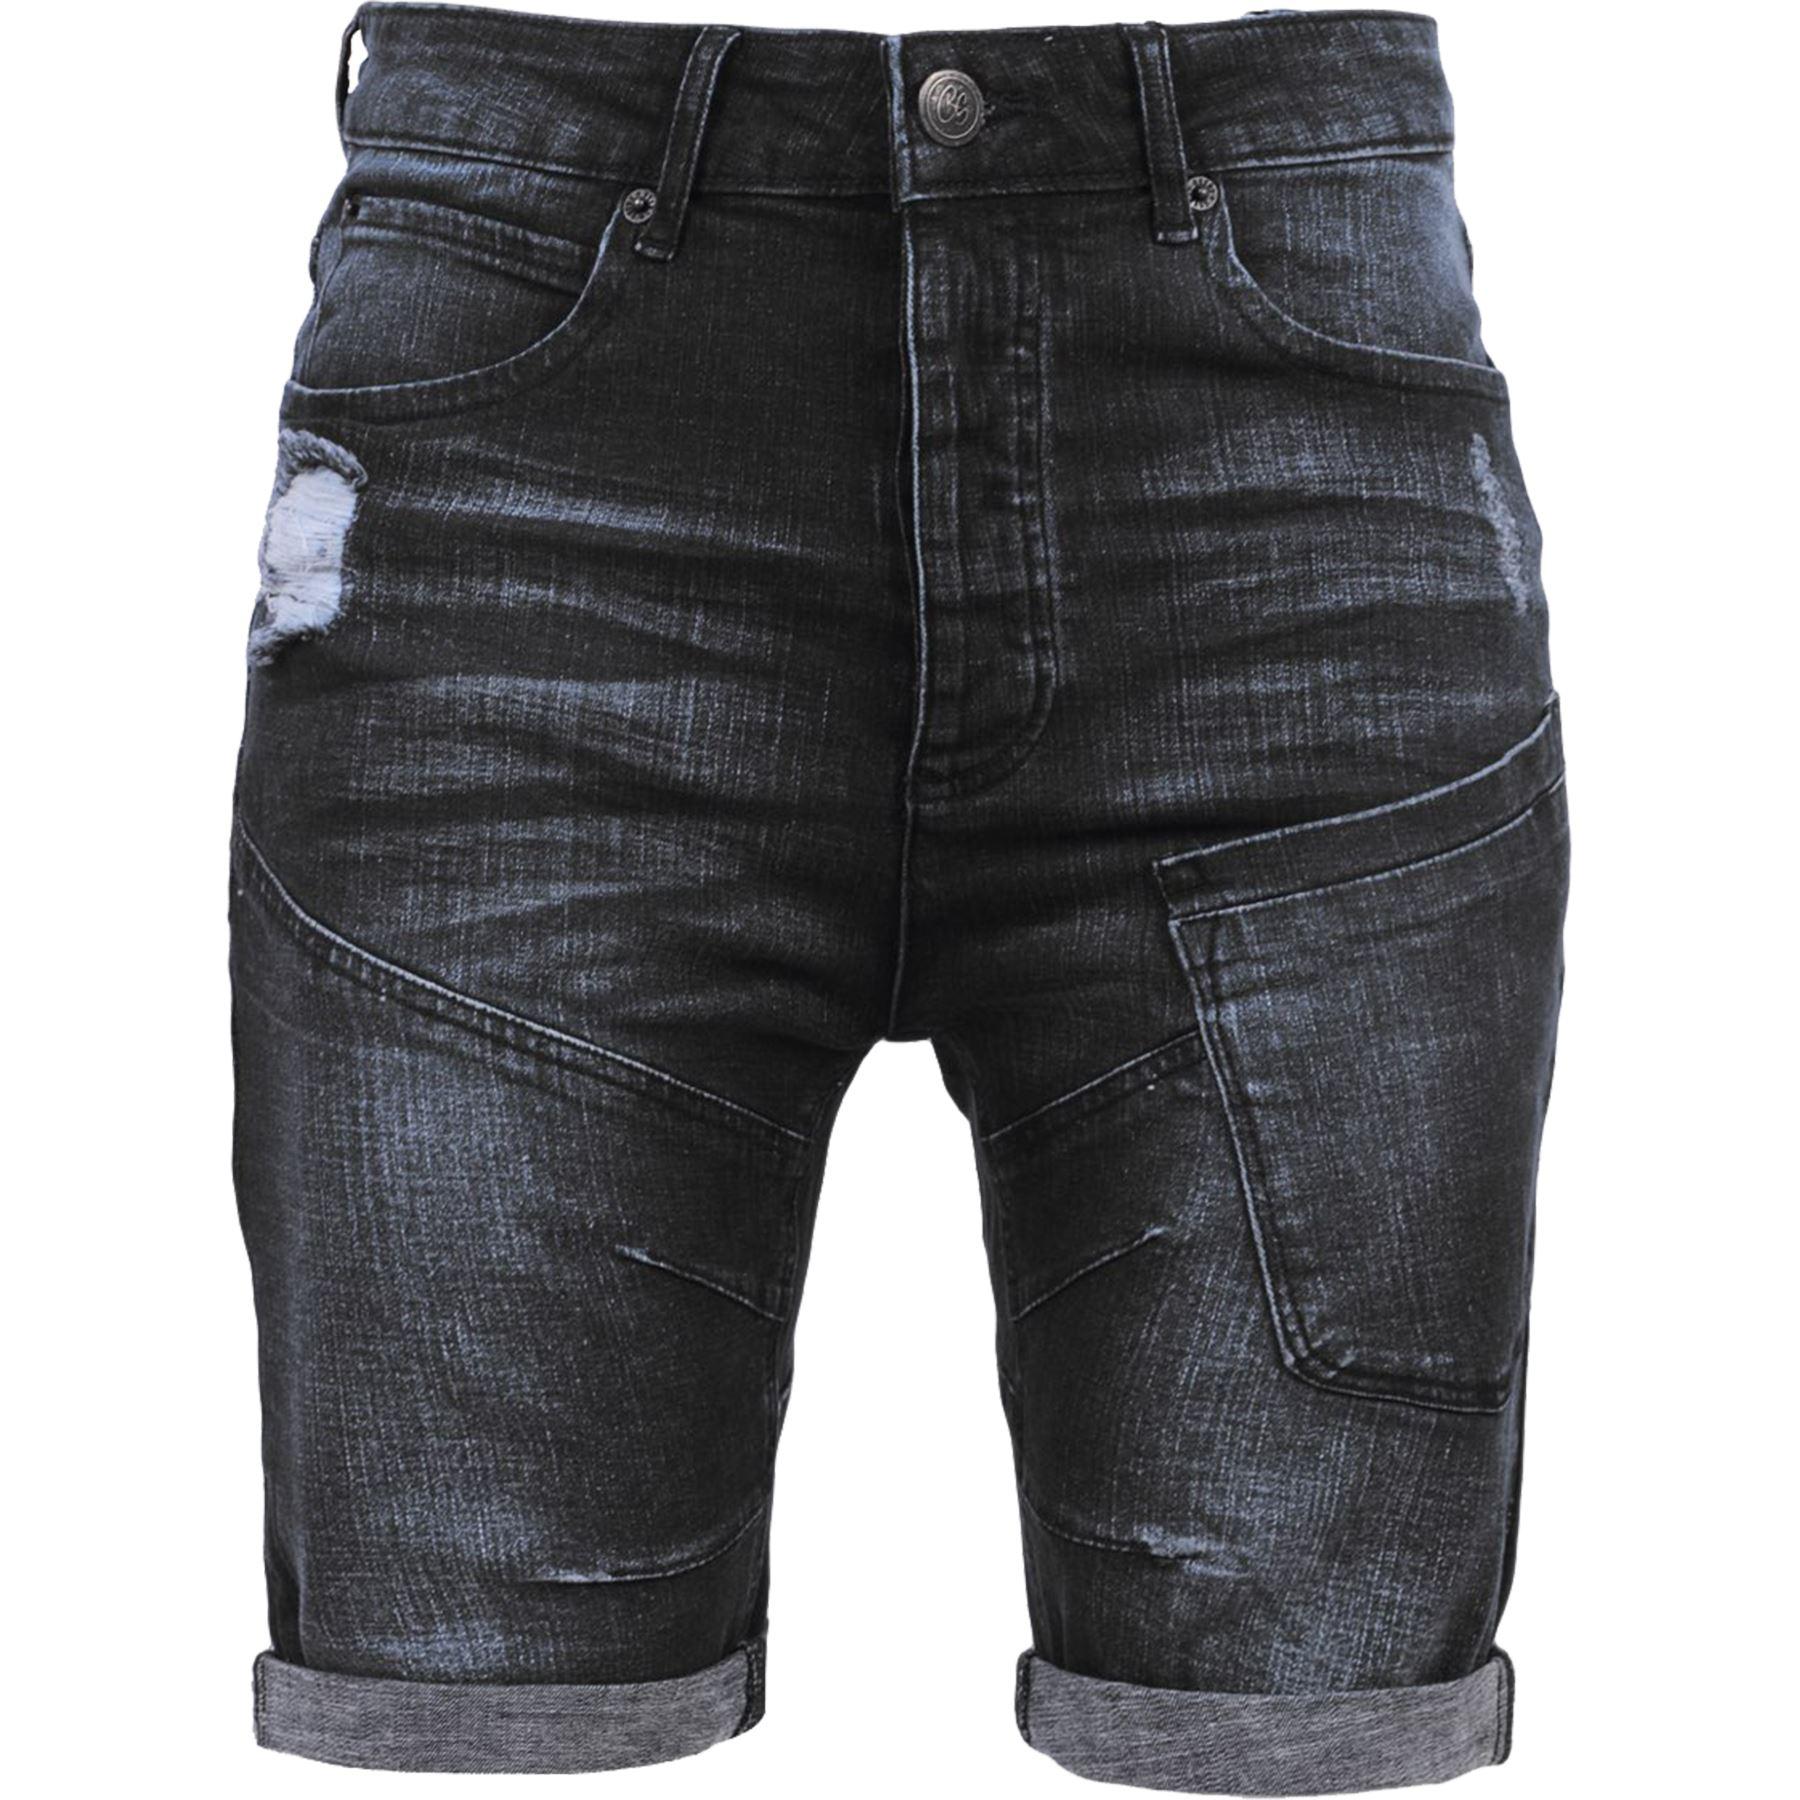 New-Mens-Crosshatch-Canvas-Cargo-Denim-Camo-Shorts-Chino-2019-Styles-30-42-034 thumbnail 48